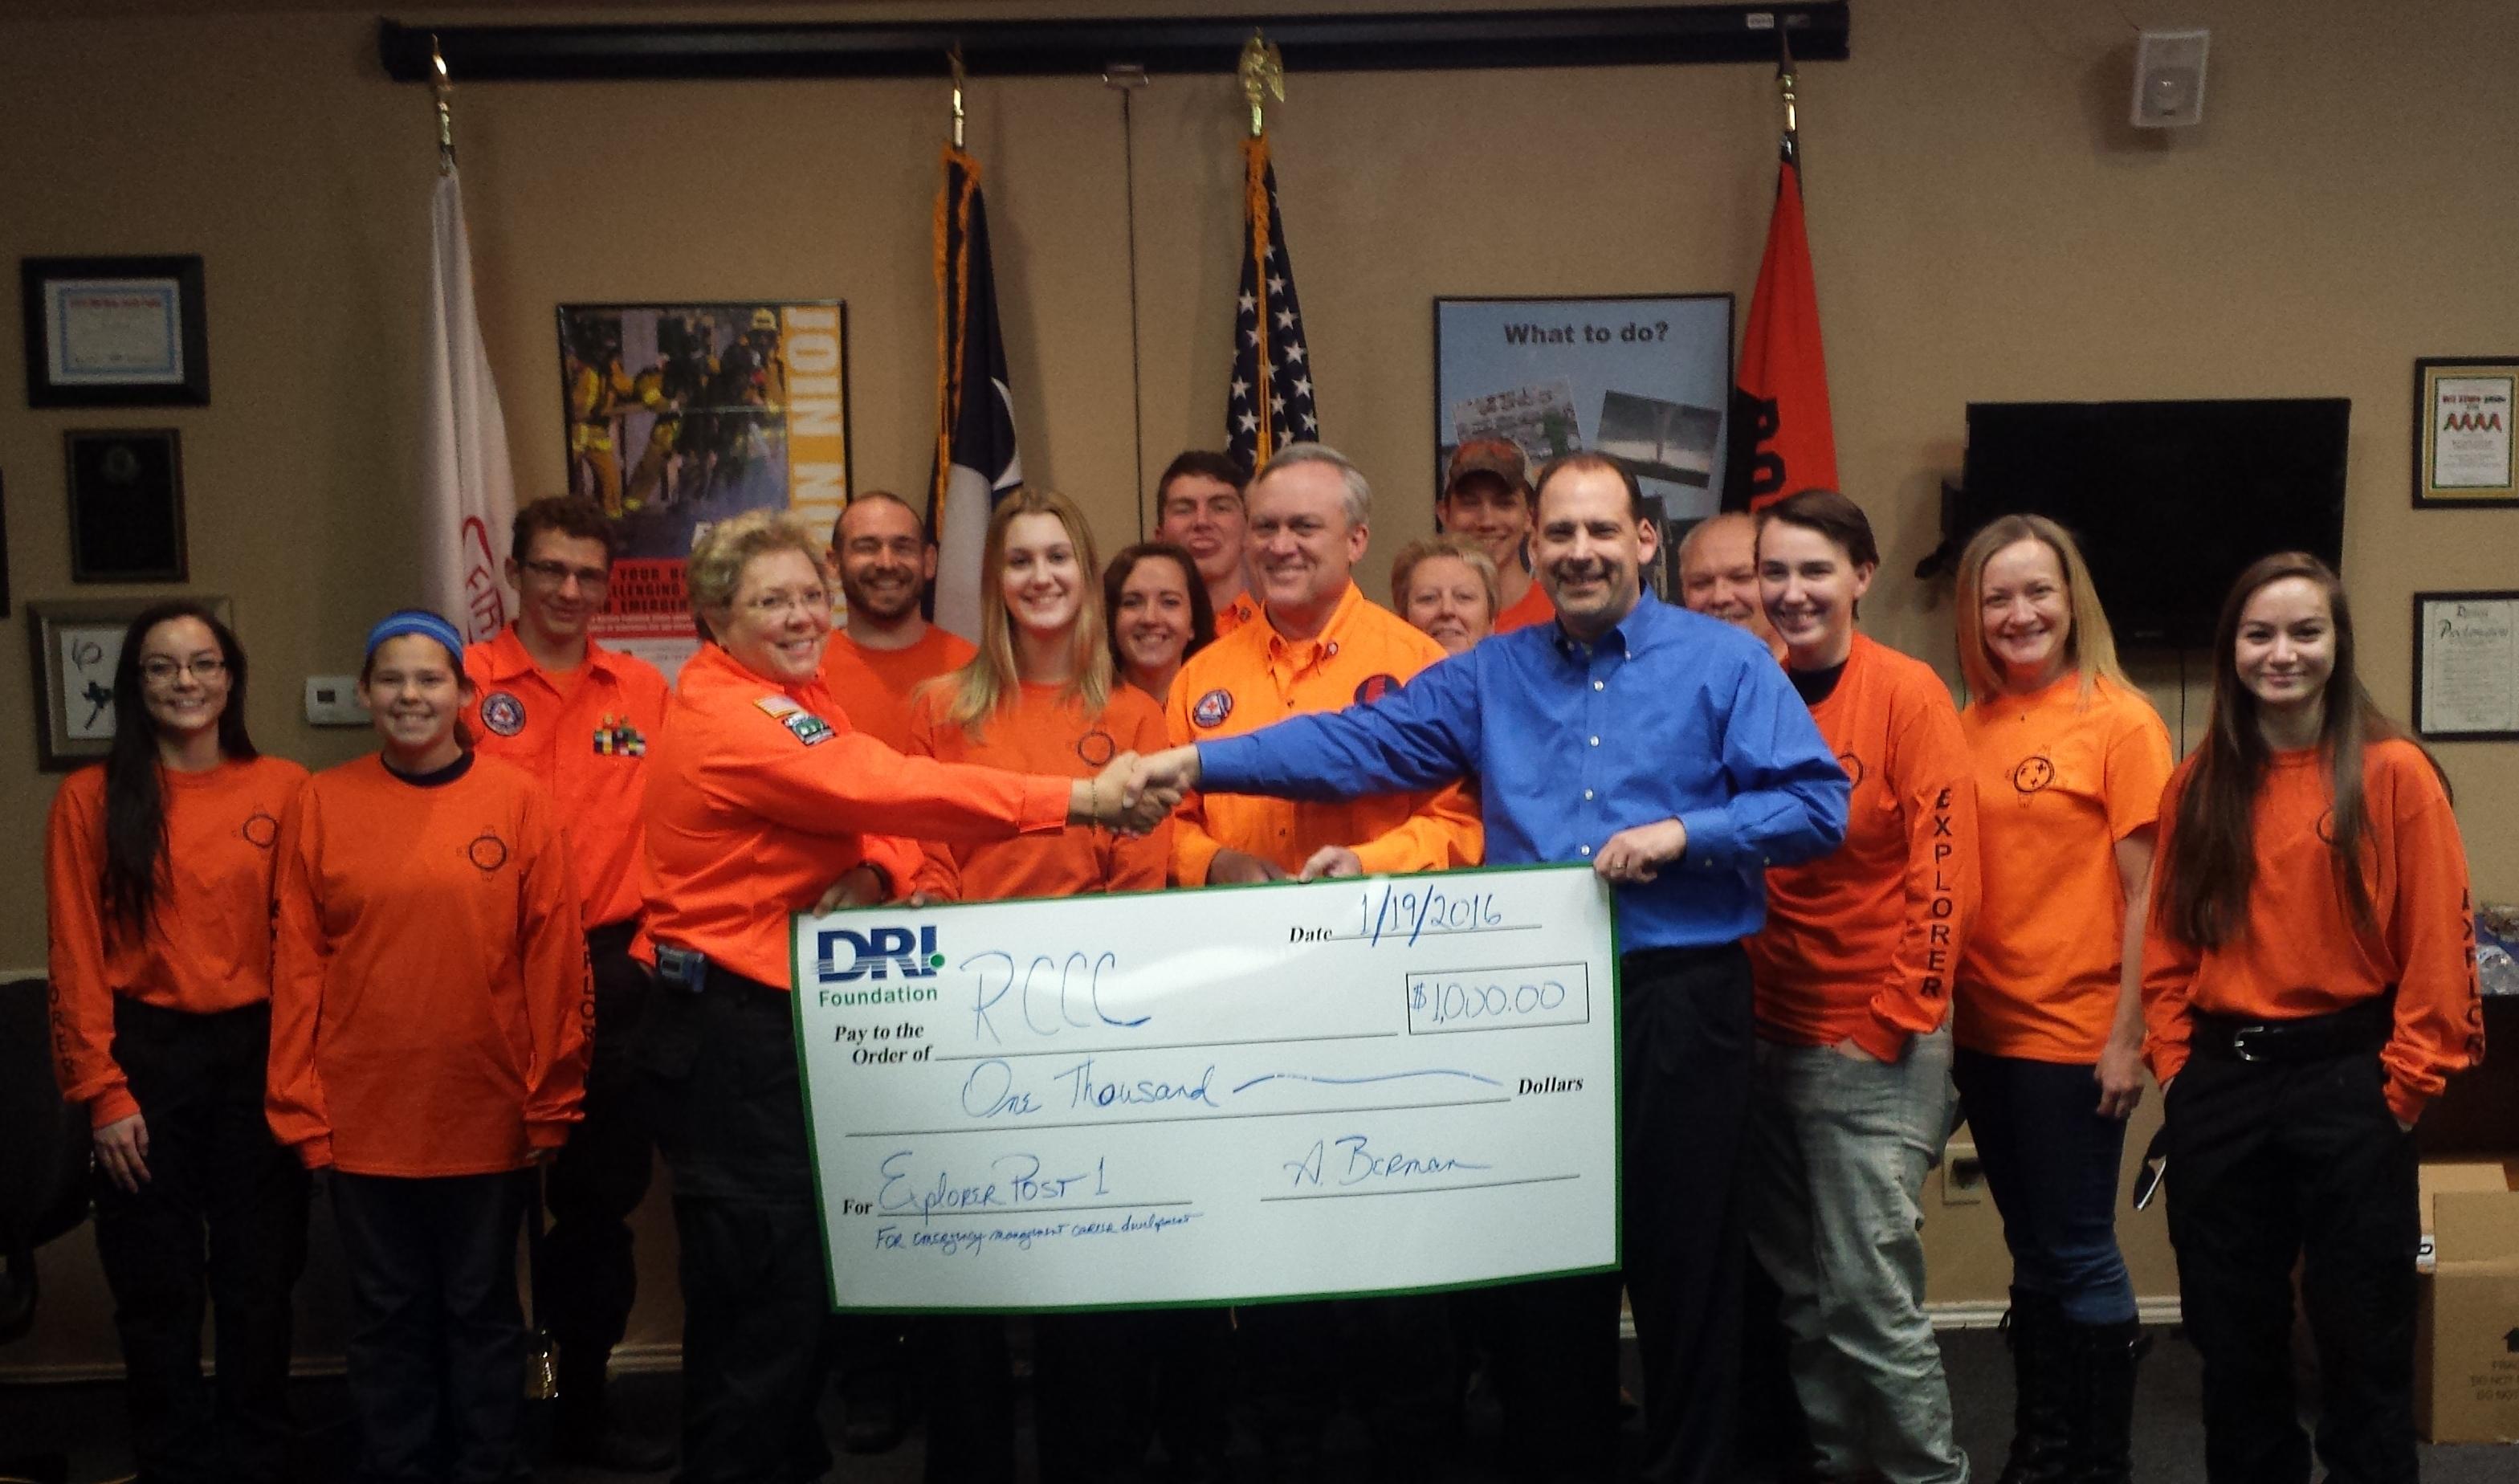 DRI Foundation donation to Explorer Post 1 JDP